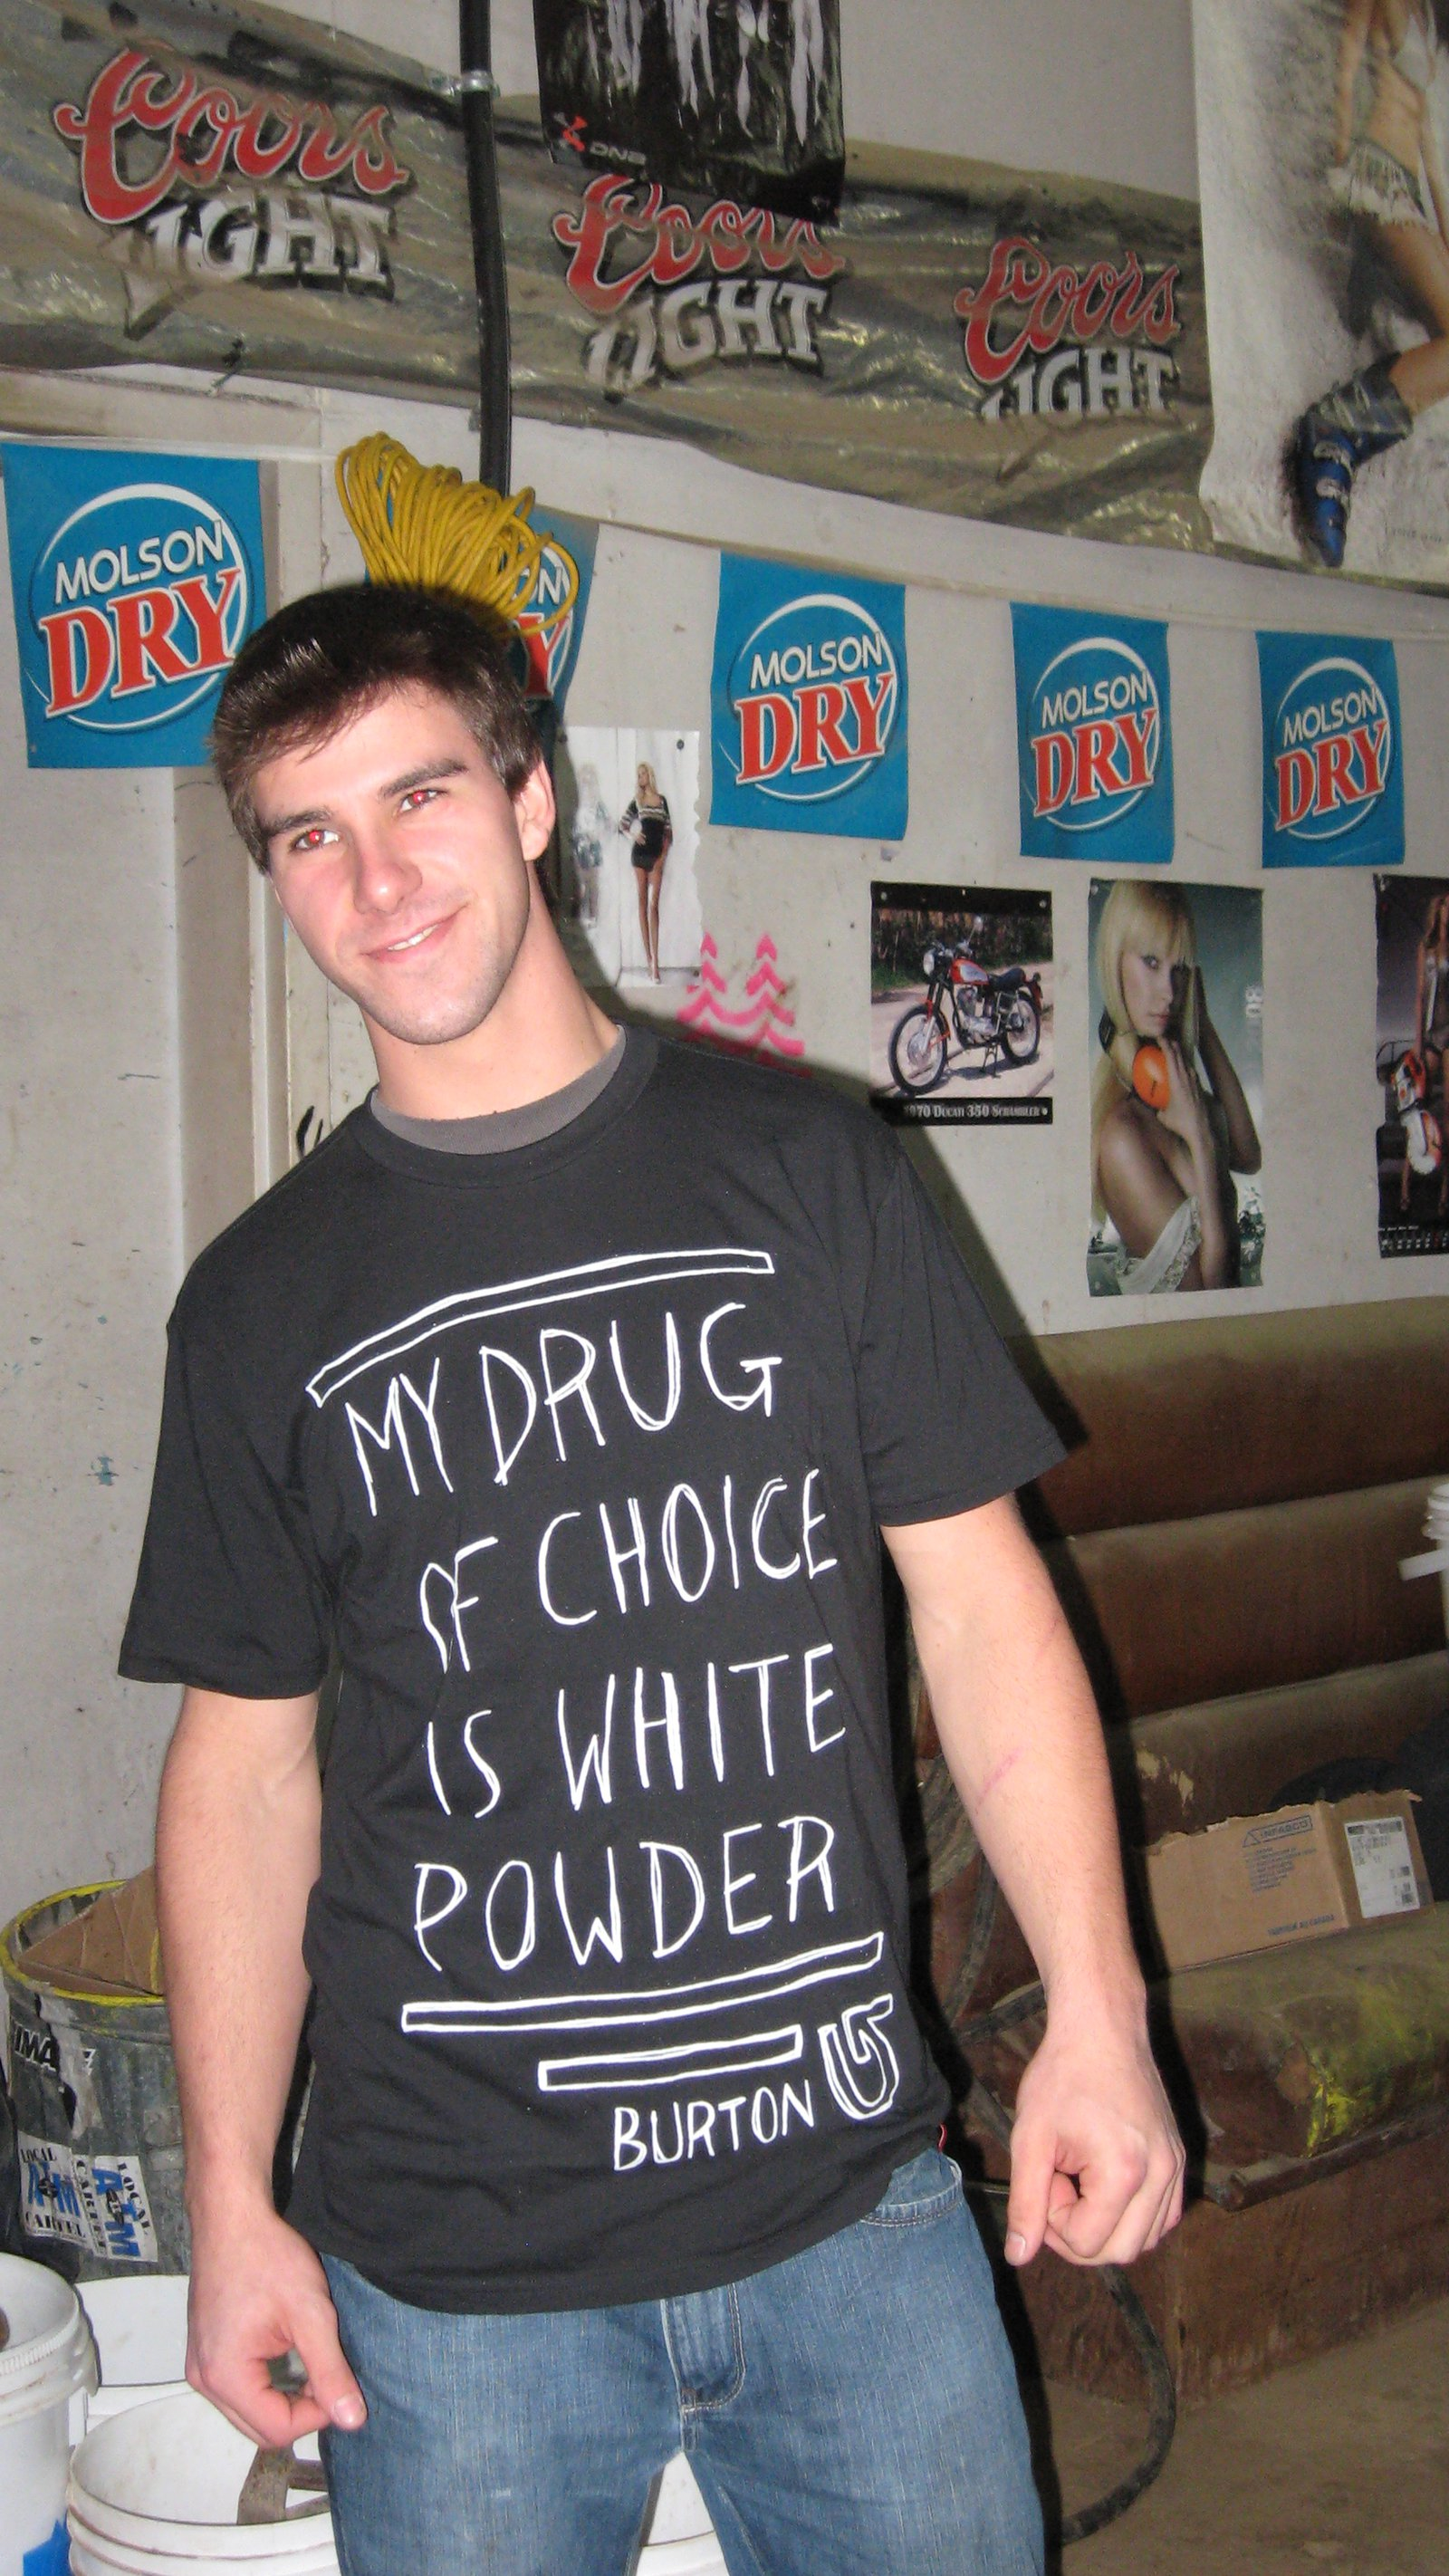 Nice shirt lol